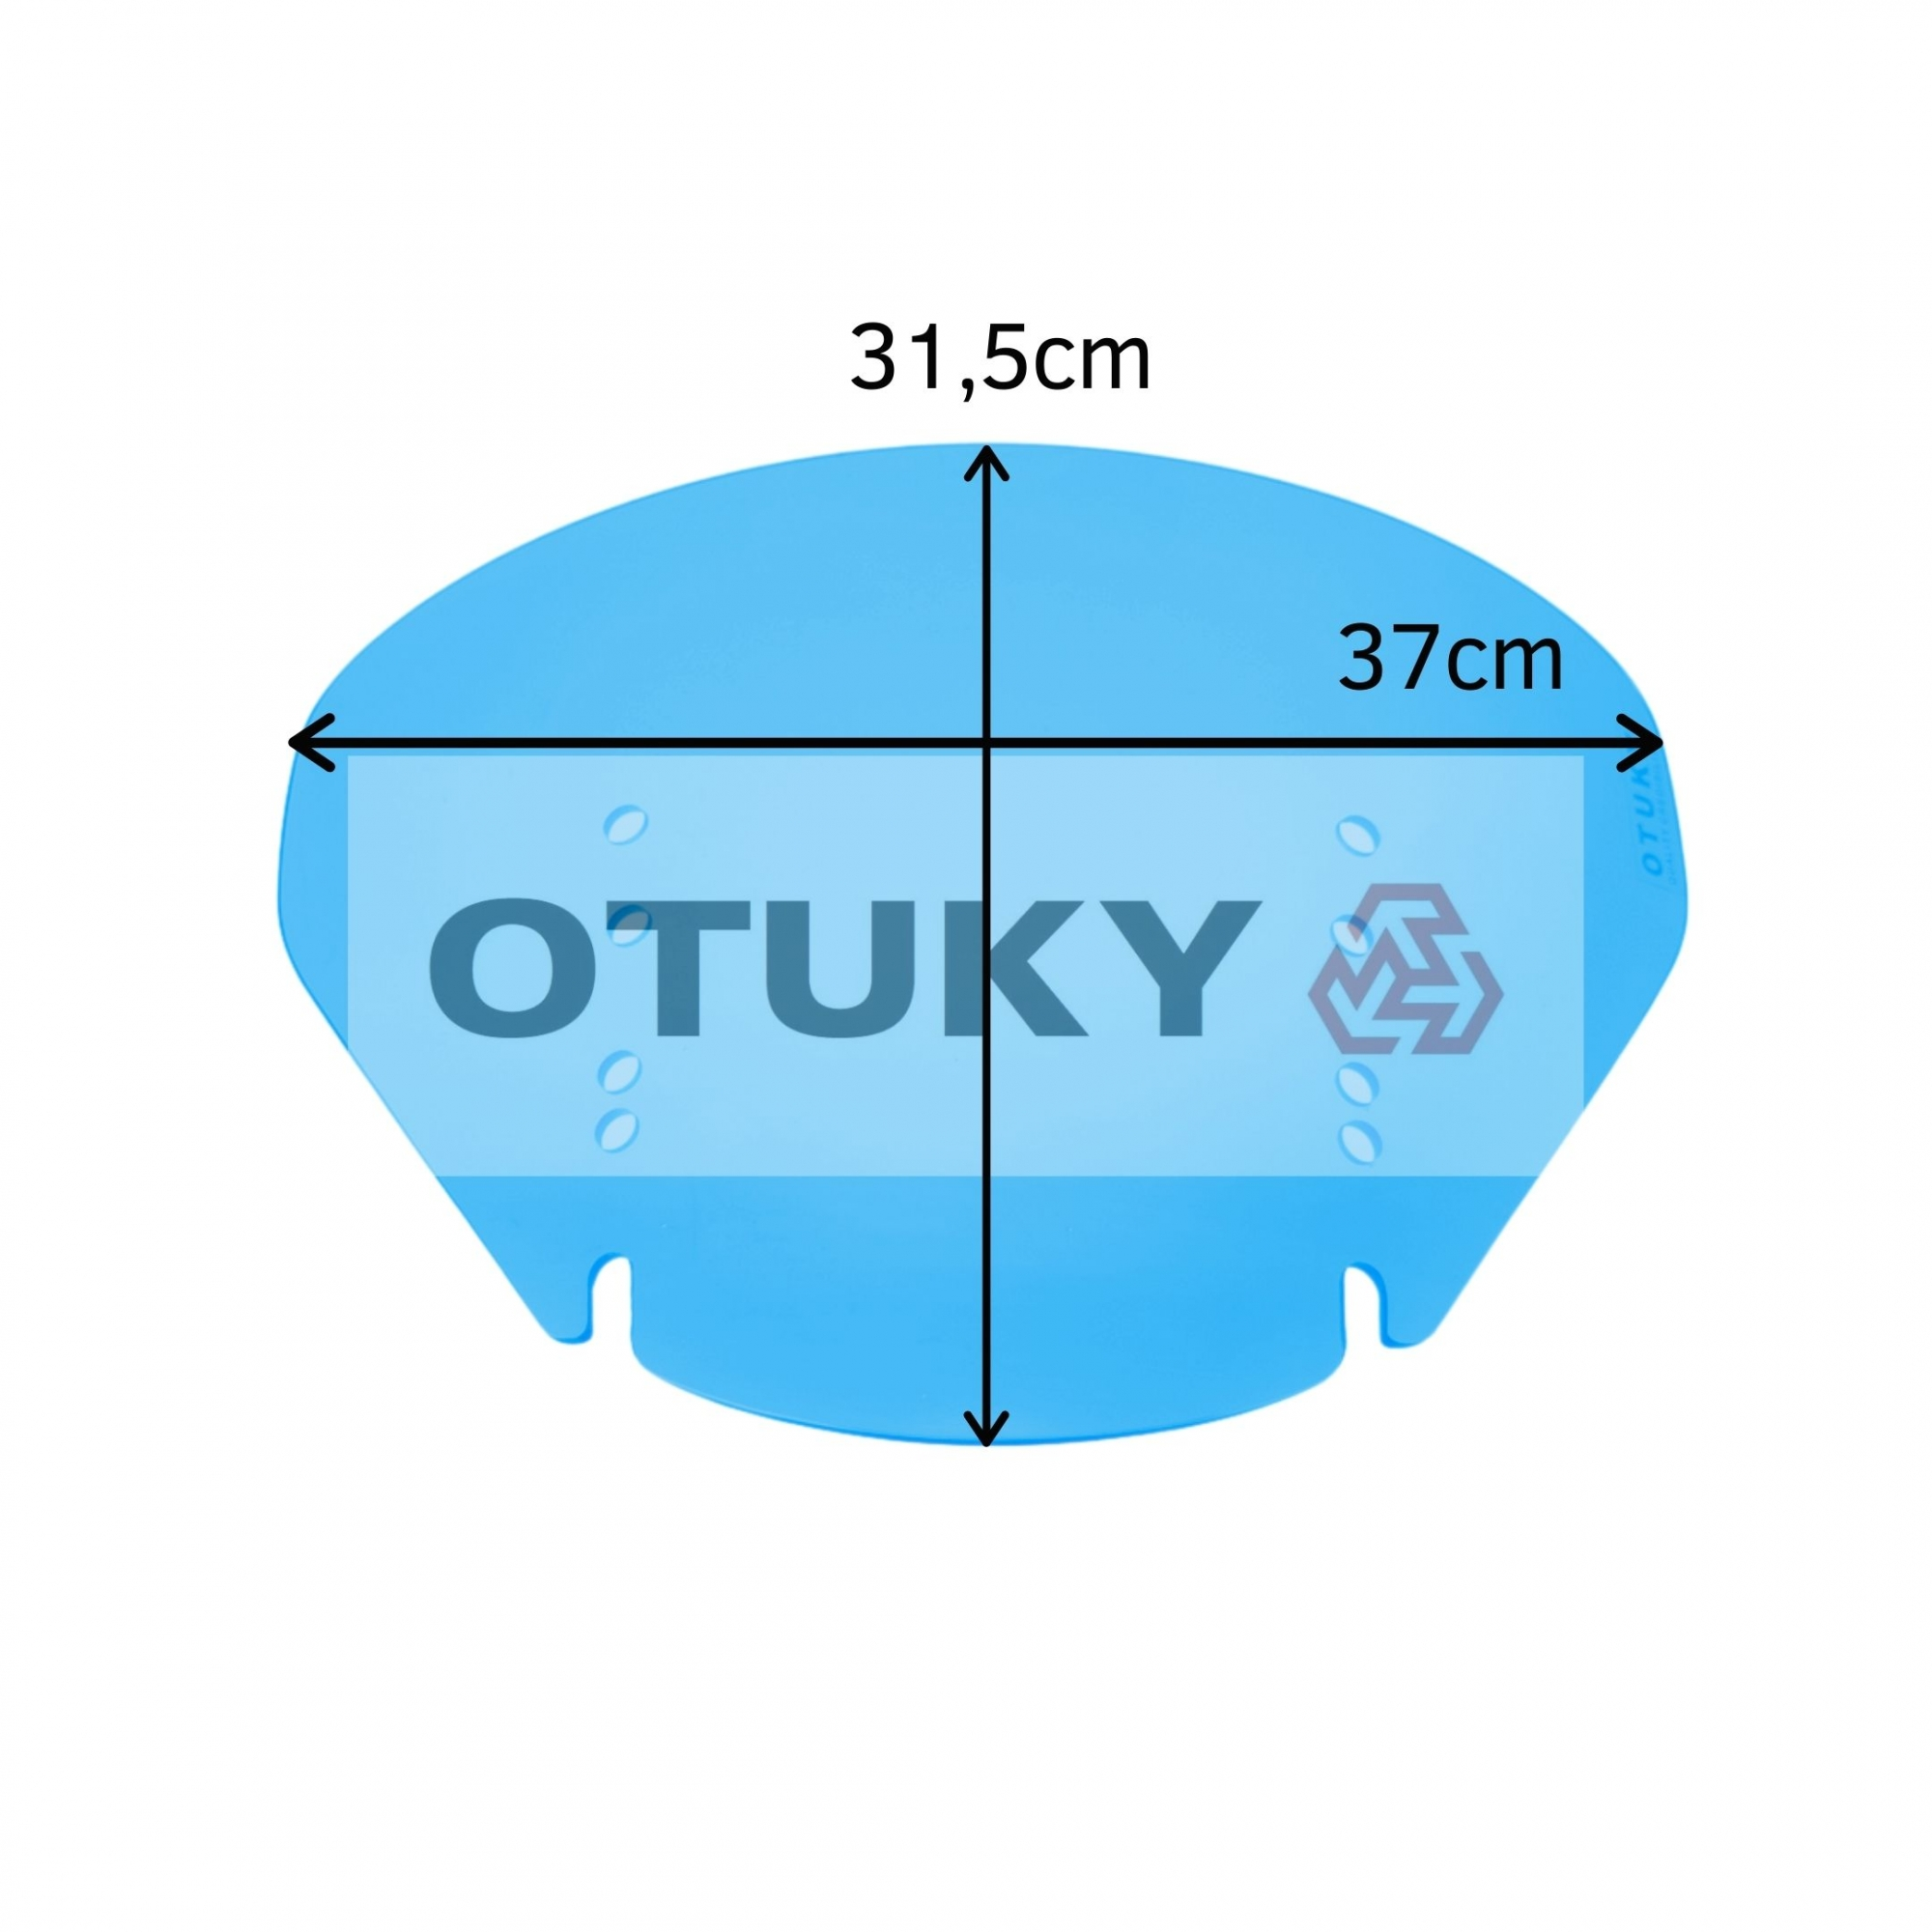 Bolha para Moto V-Strom DL 650 1000 2004 Até 2013 Menor Otuky Azul Claro